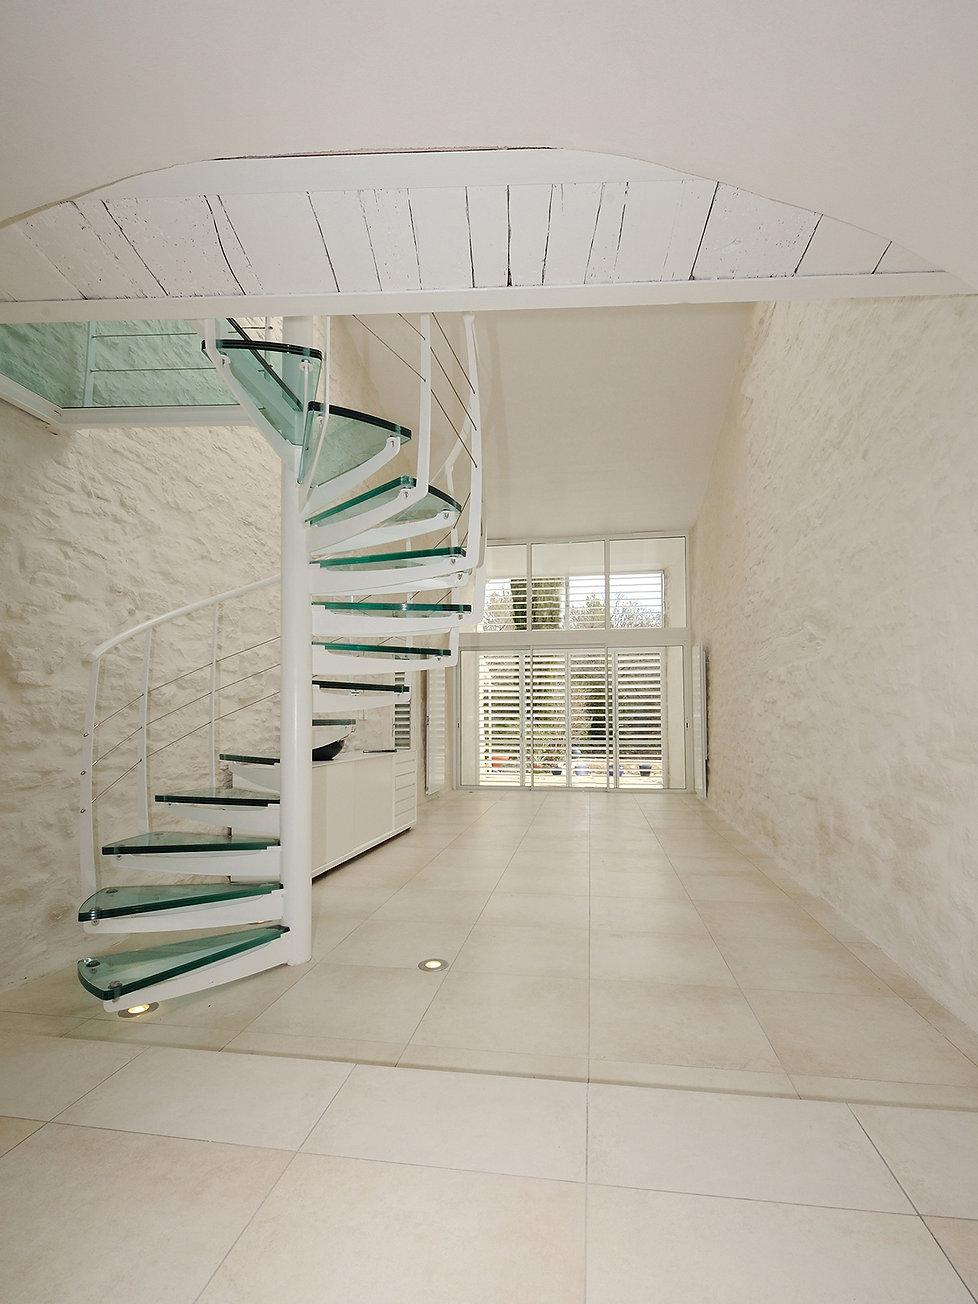 Maison blanche escalier.jpg